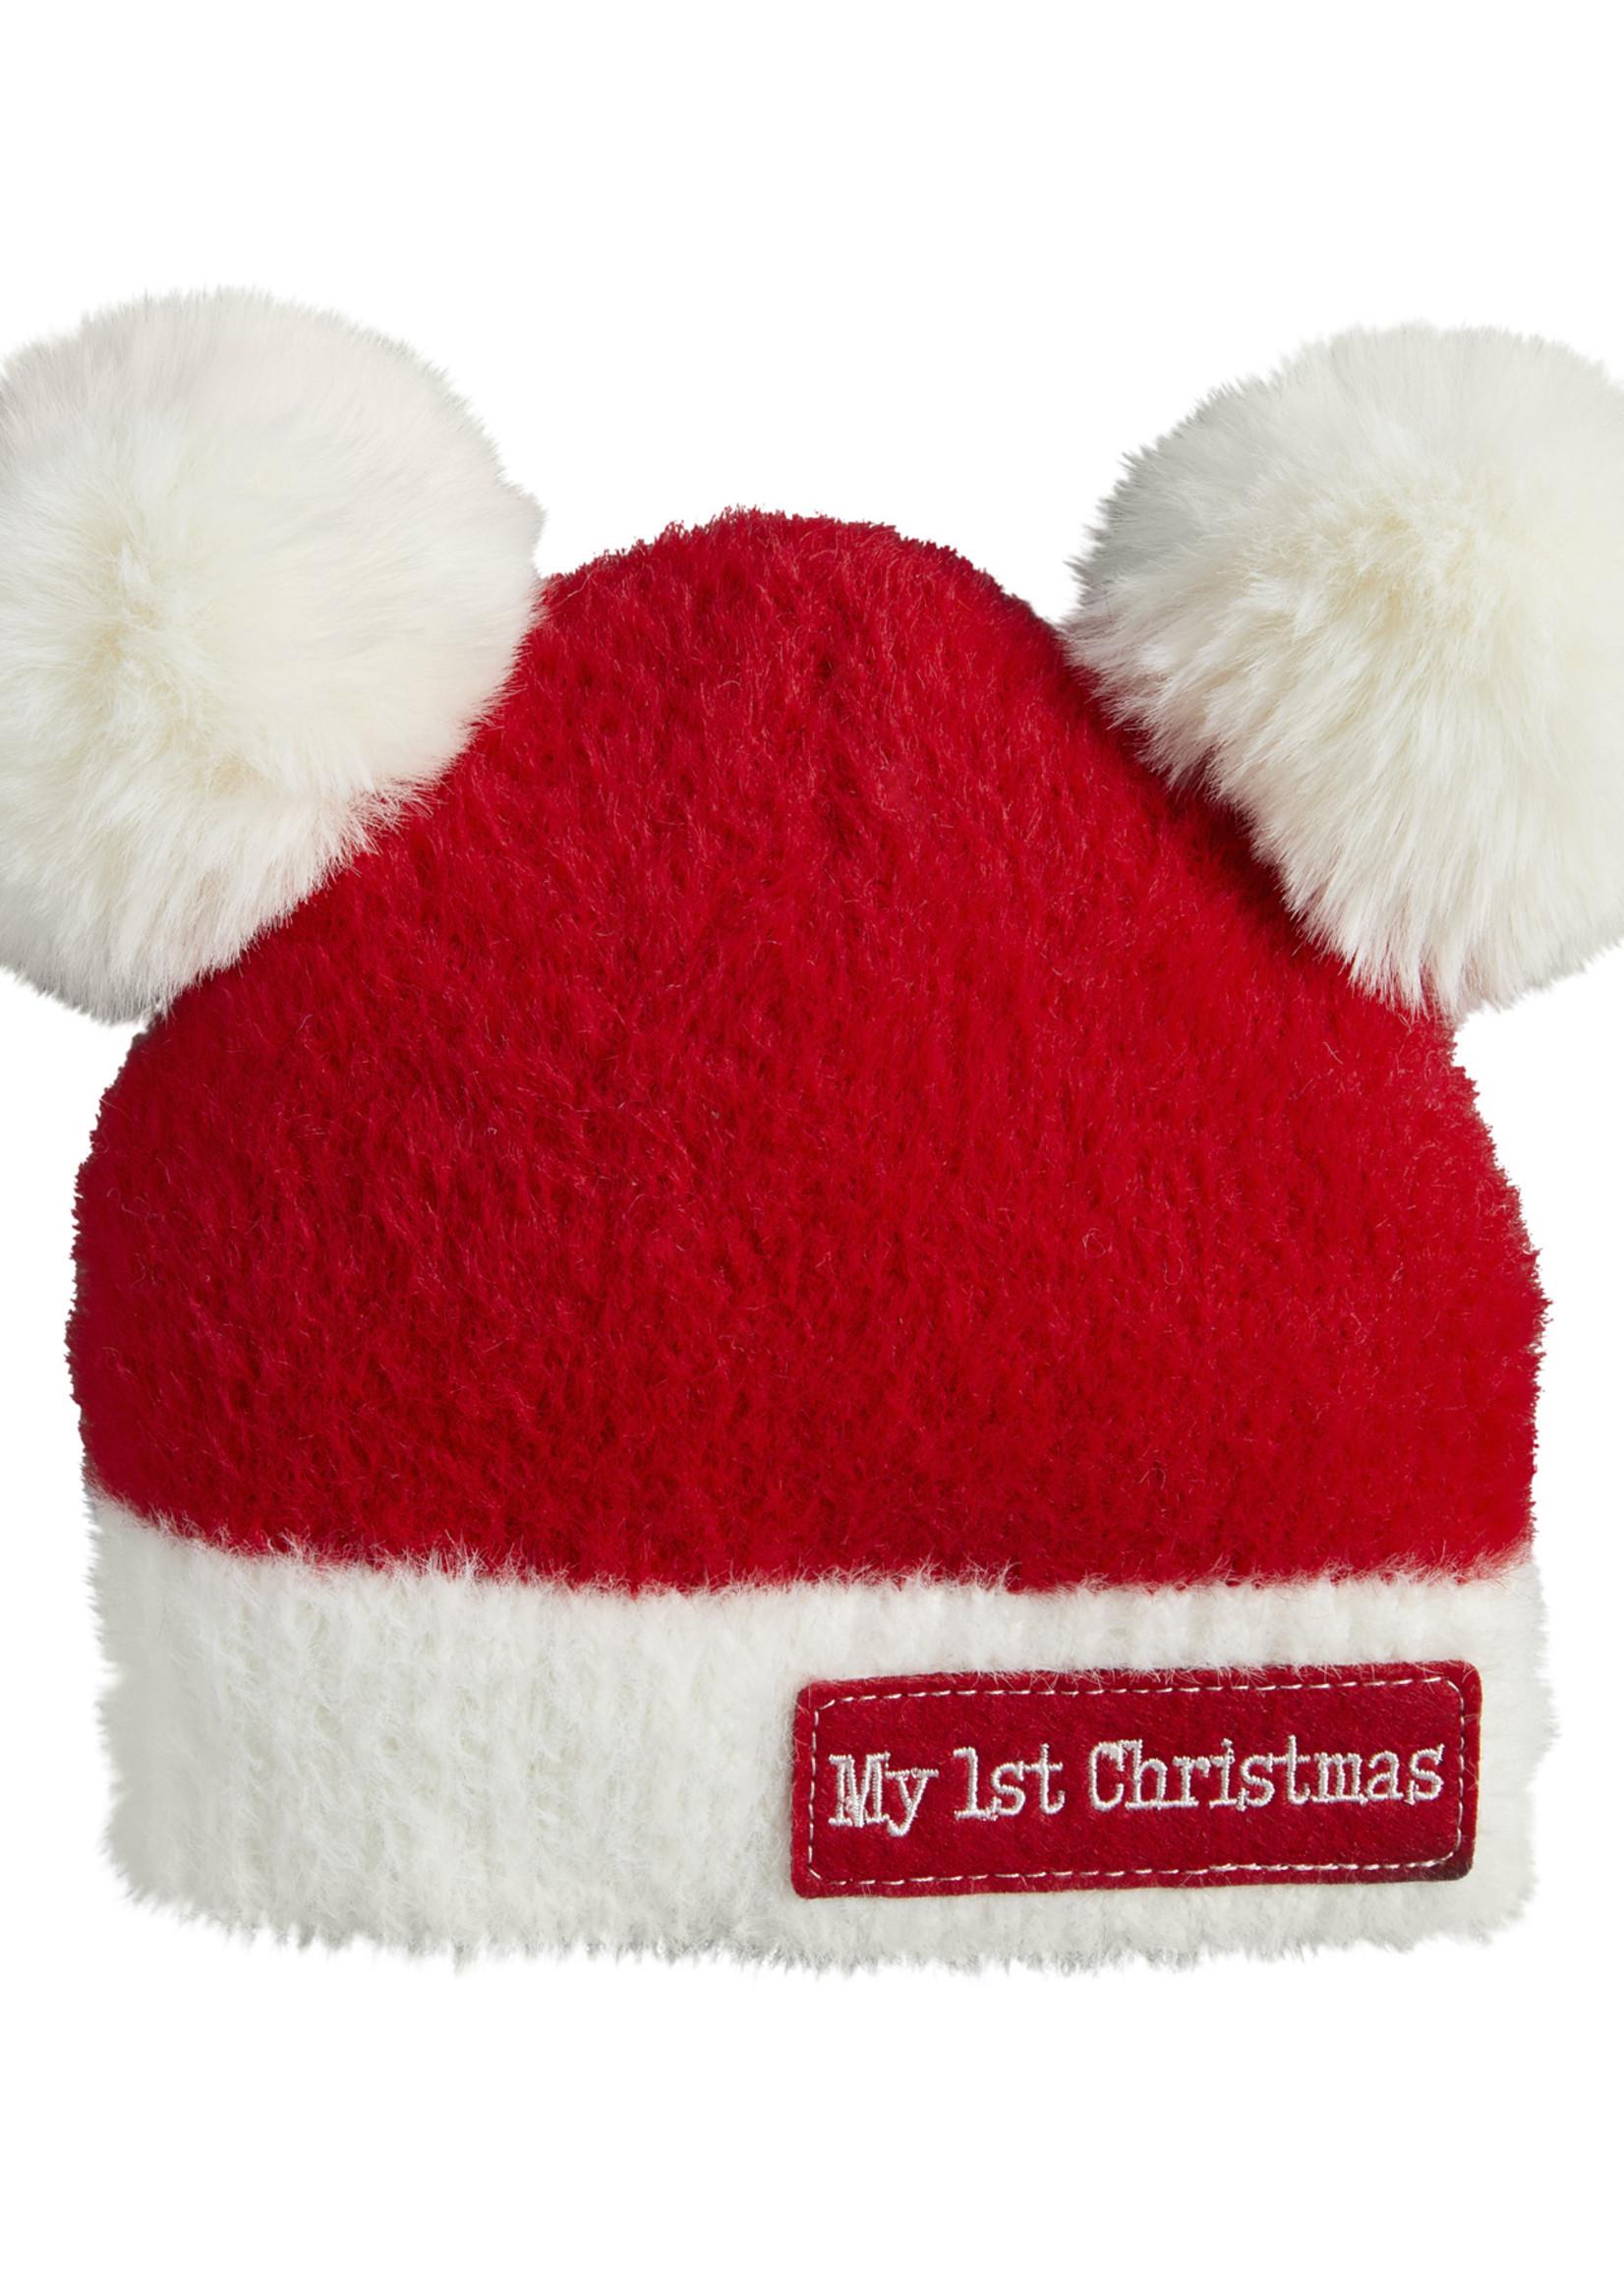 Mudpie POM POM CHRISTMAS HAT